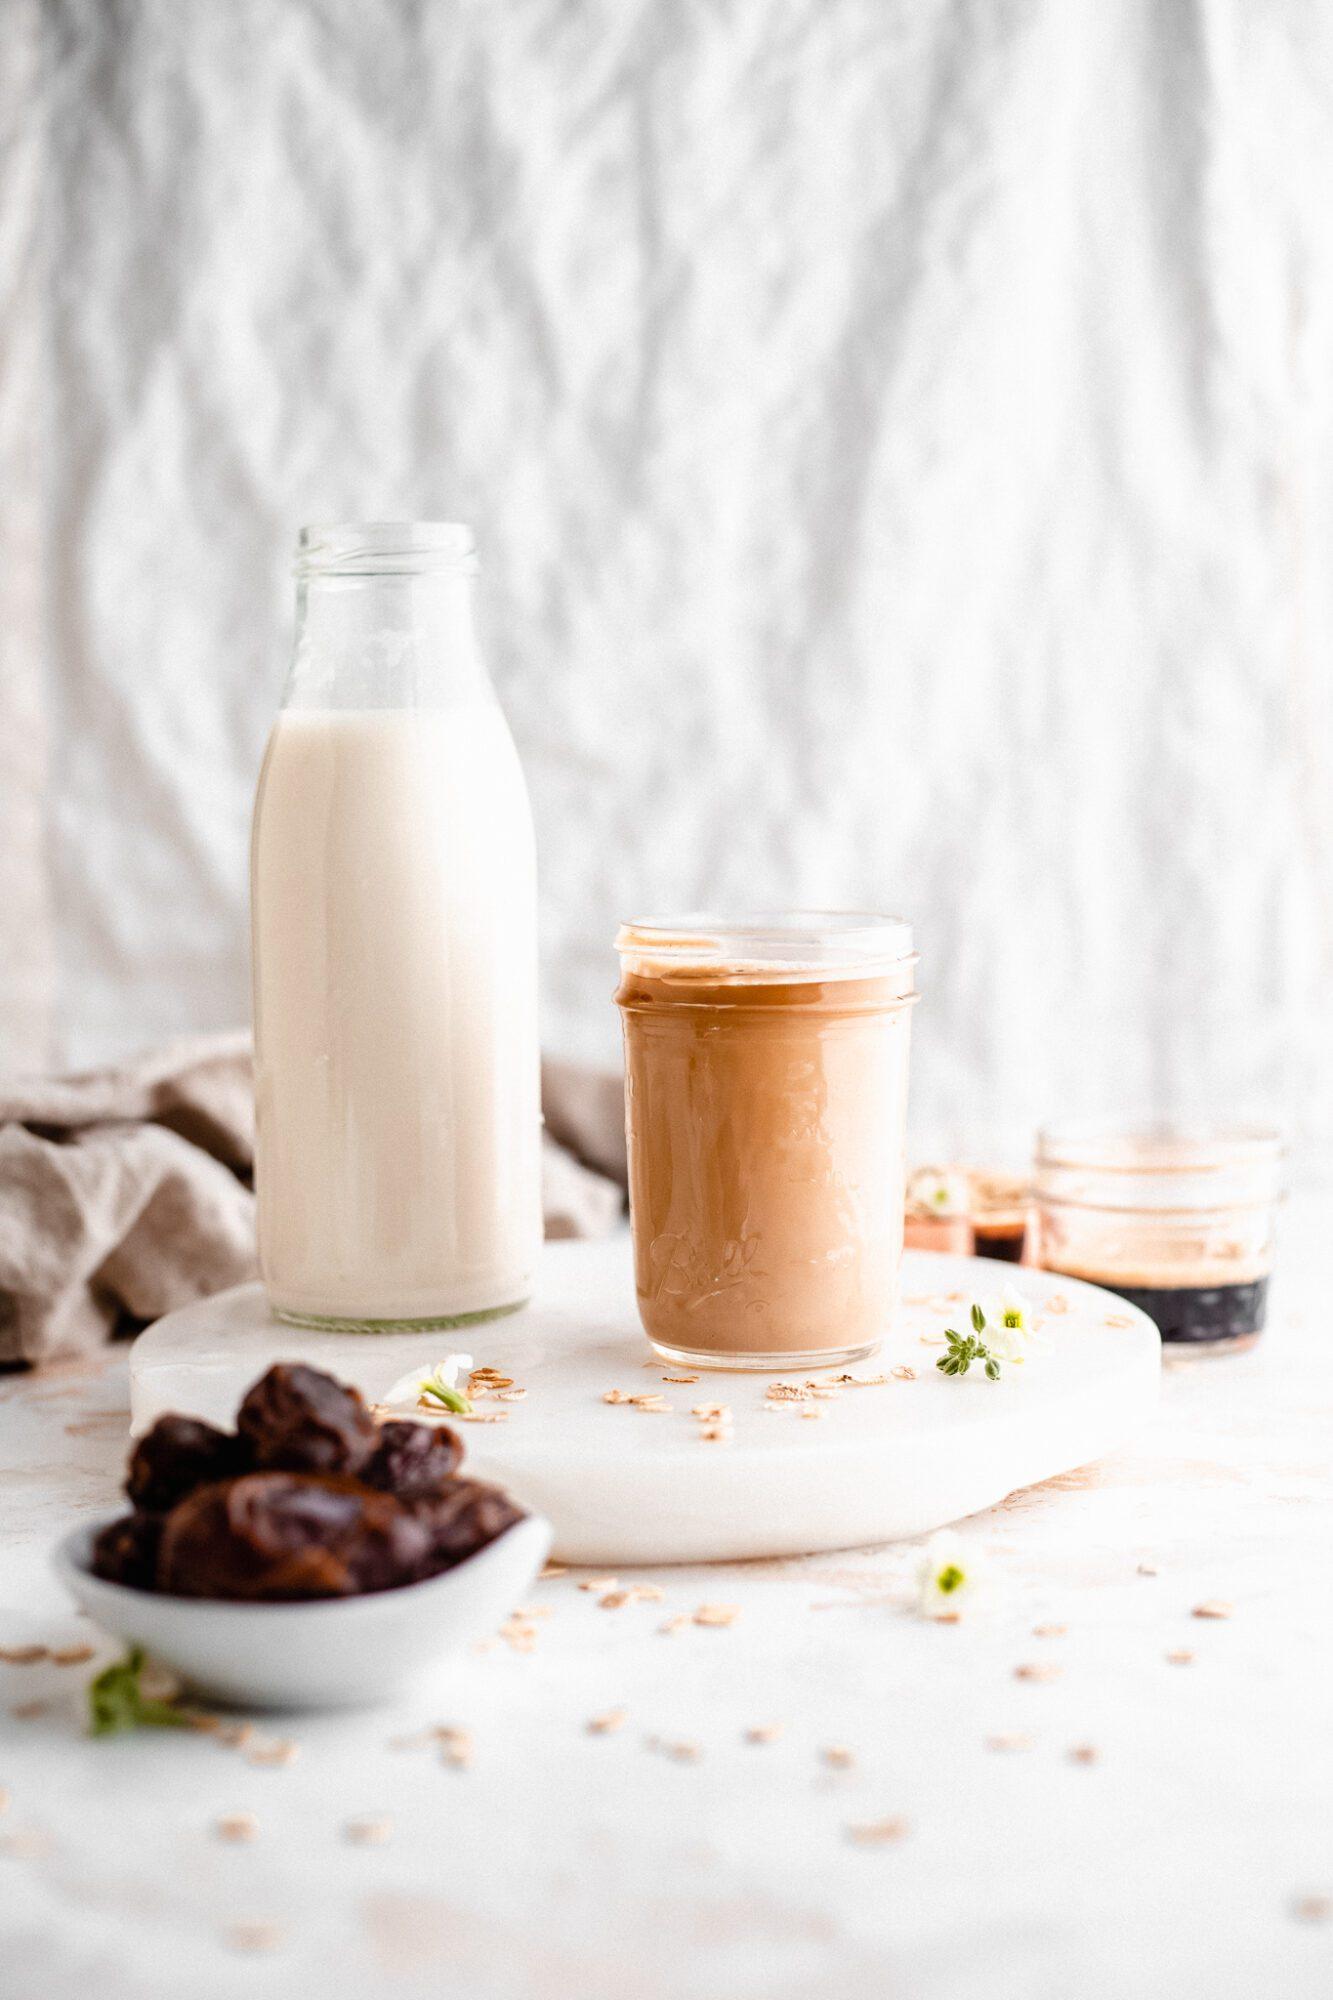 glass of oat milk with espresso